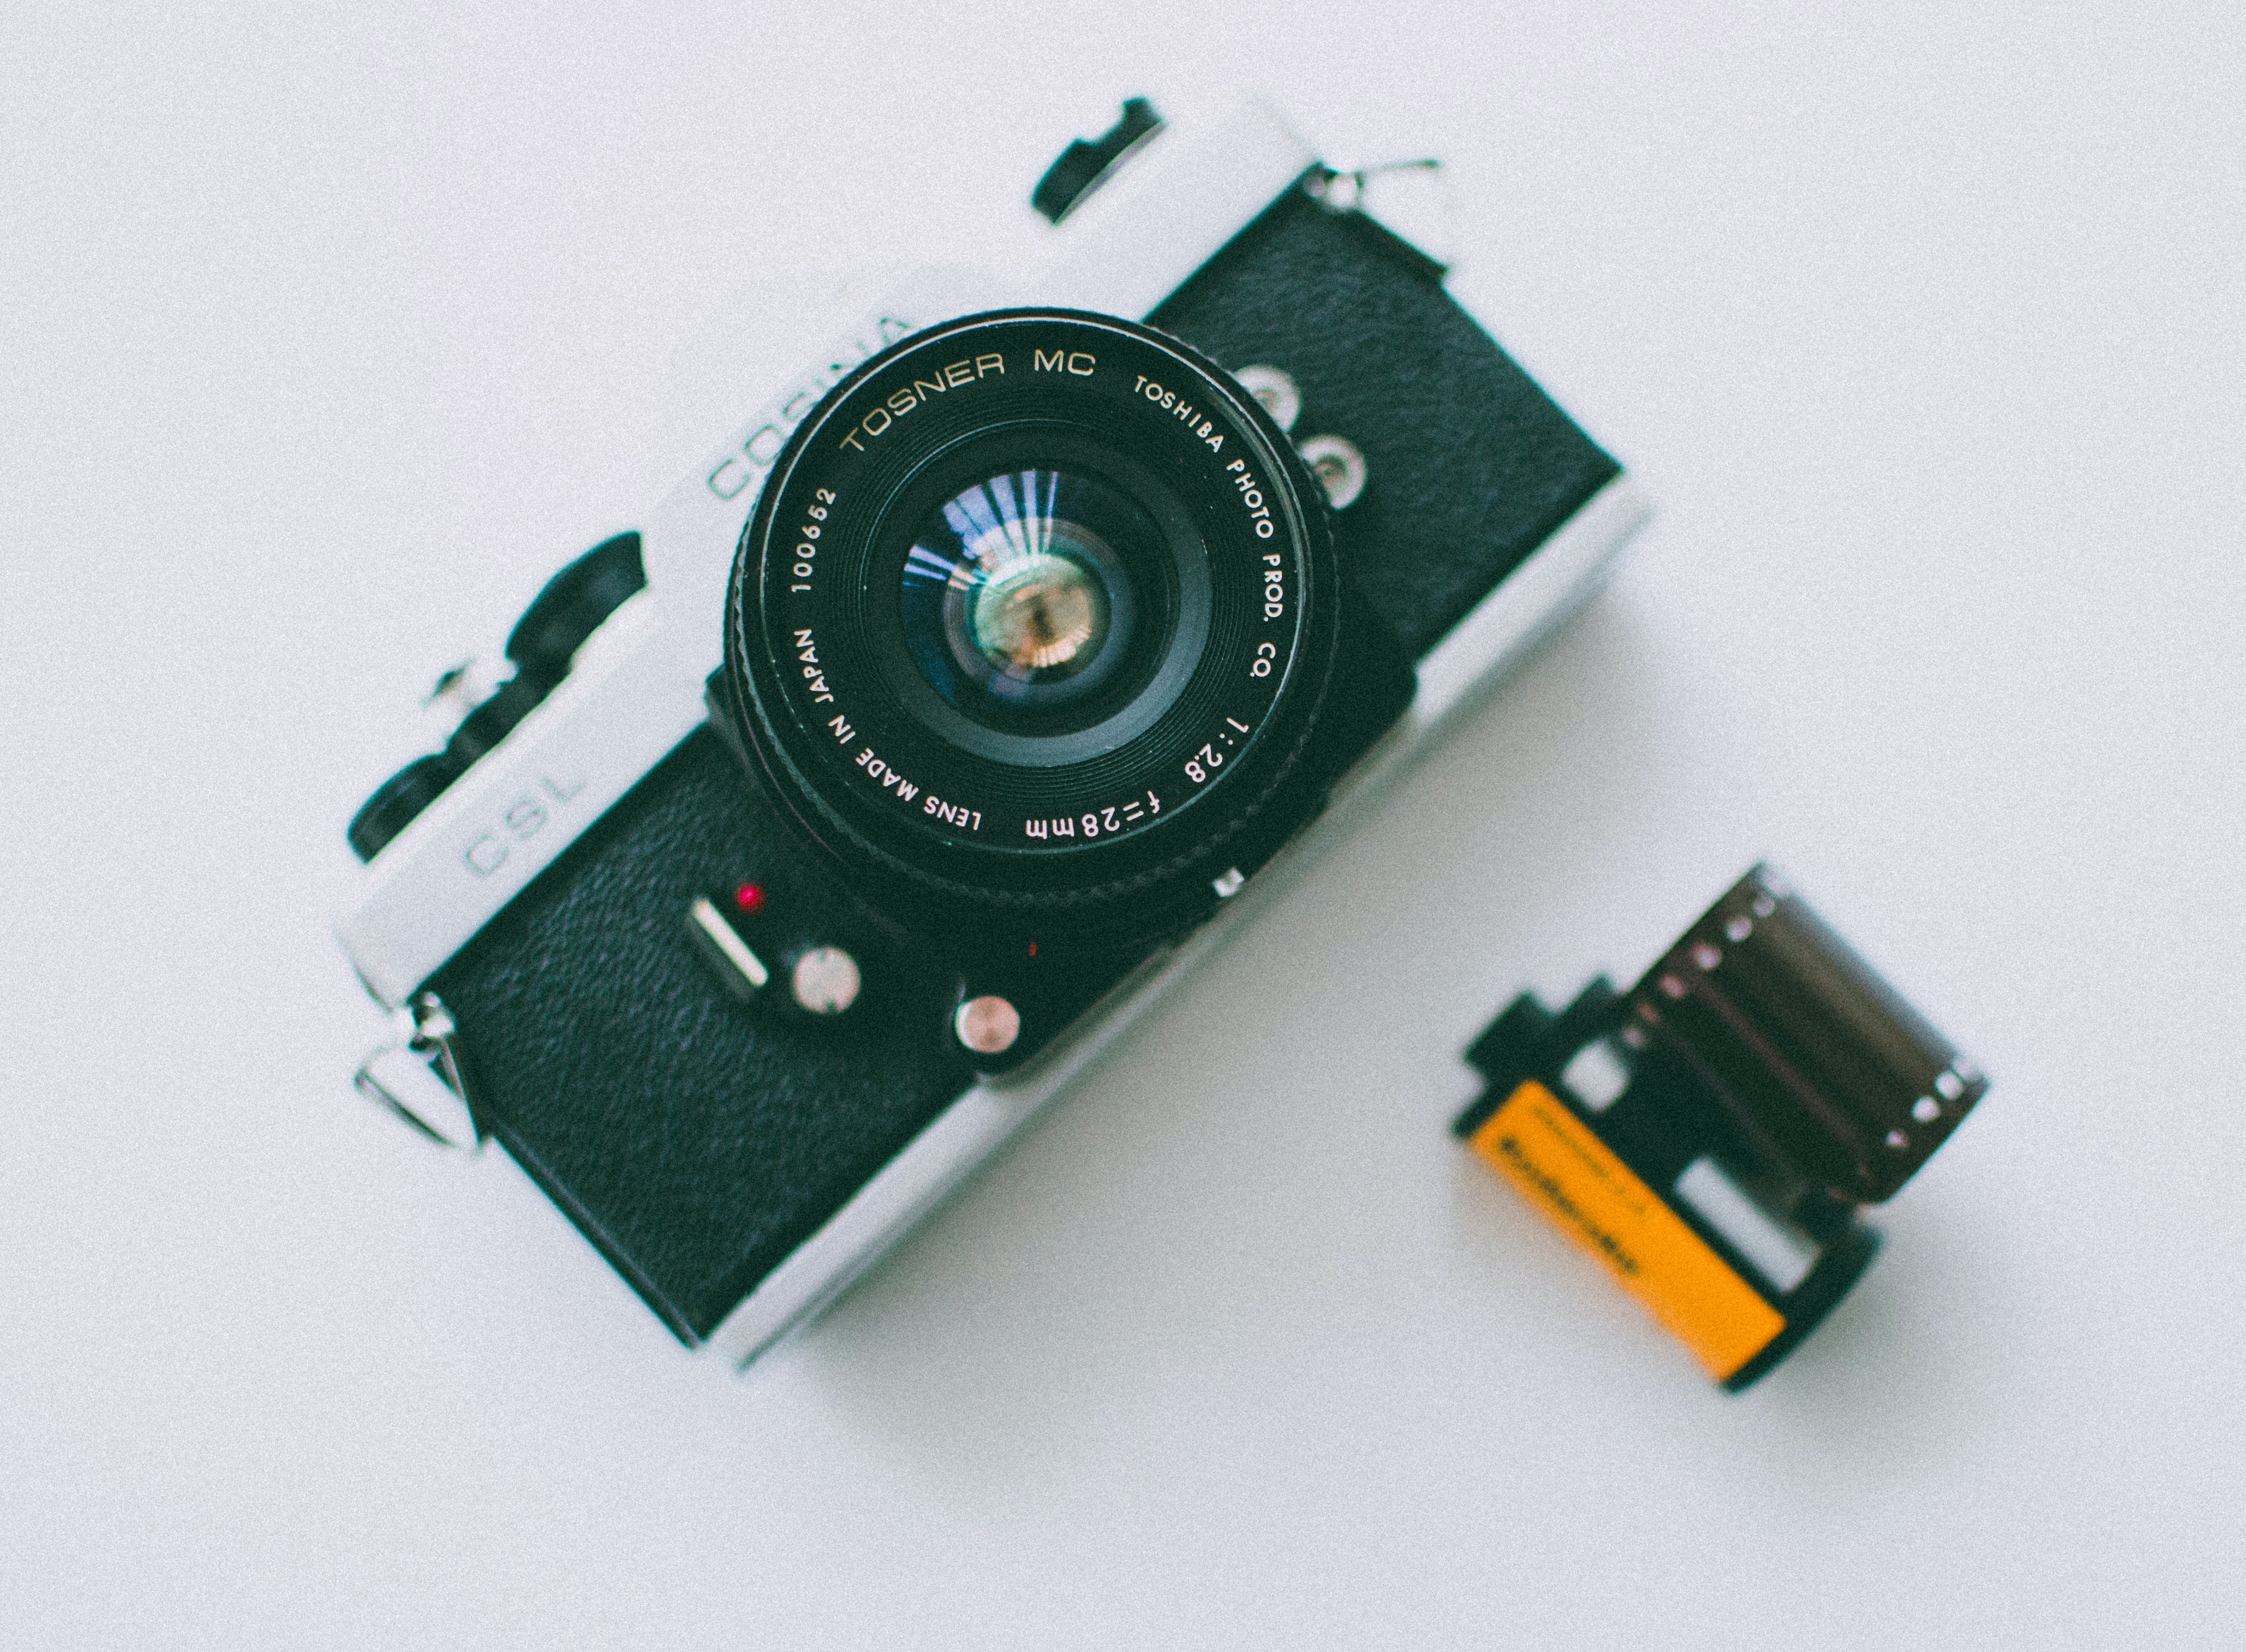 Cosina camera and film (Pic: Lisa Fotios/Pexels)